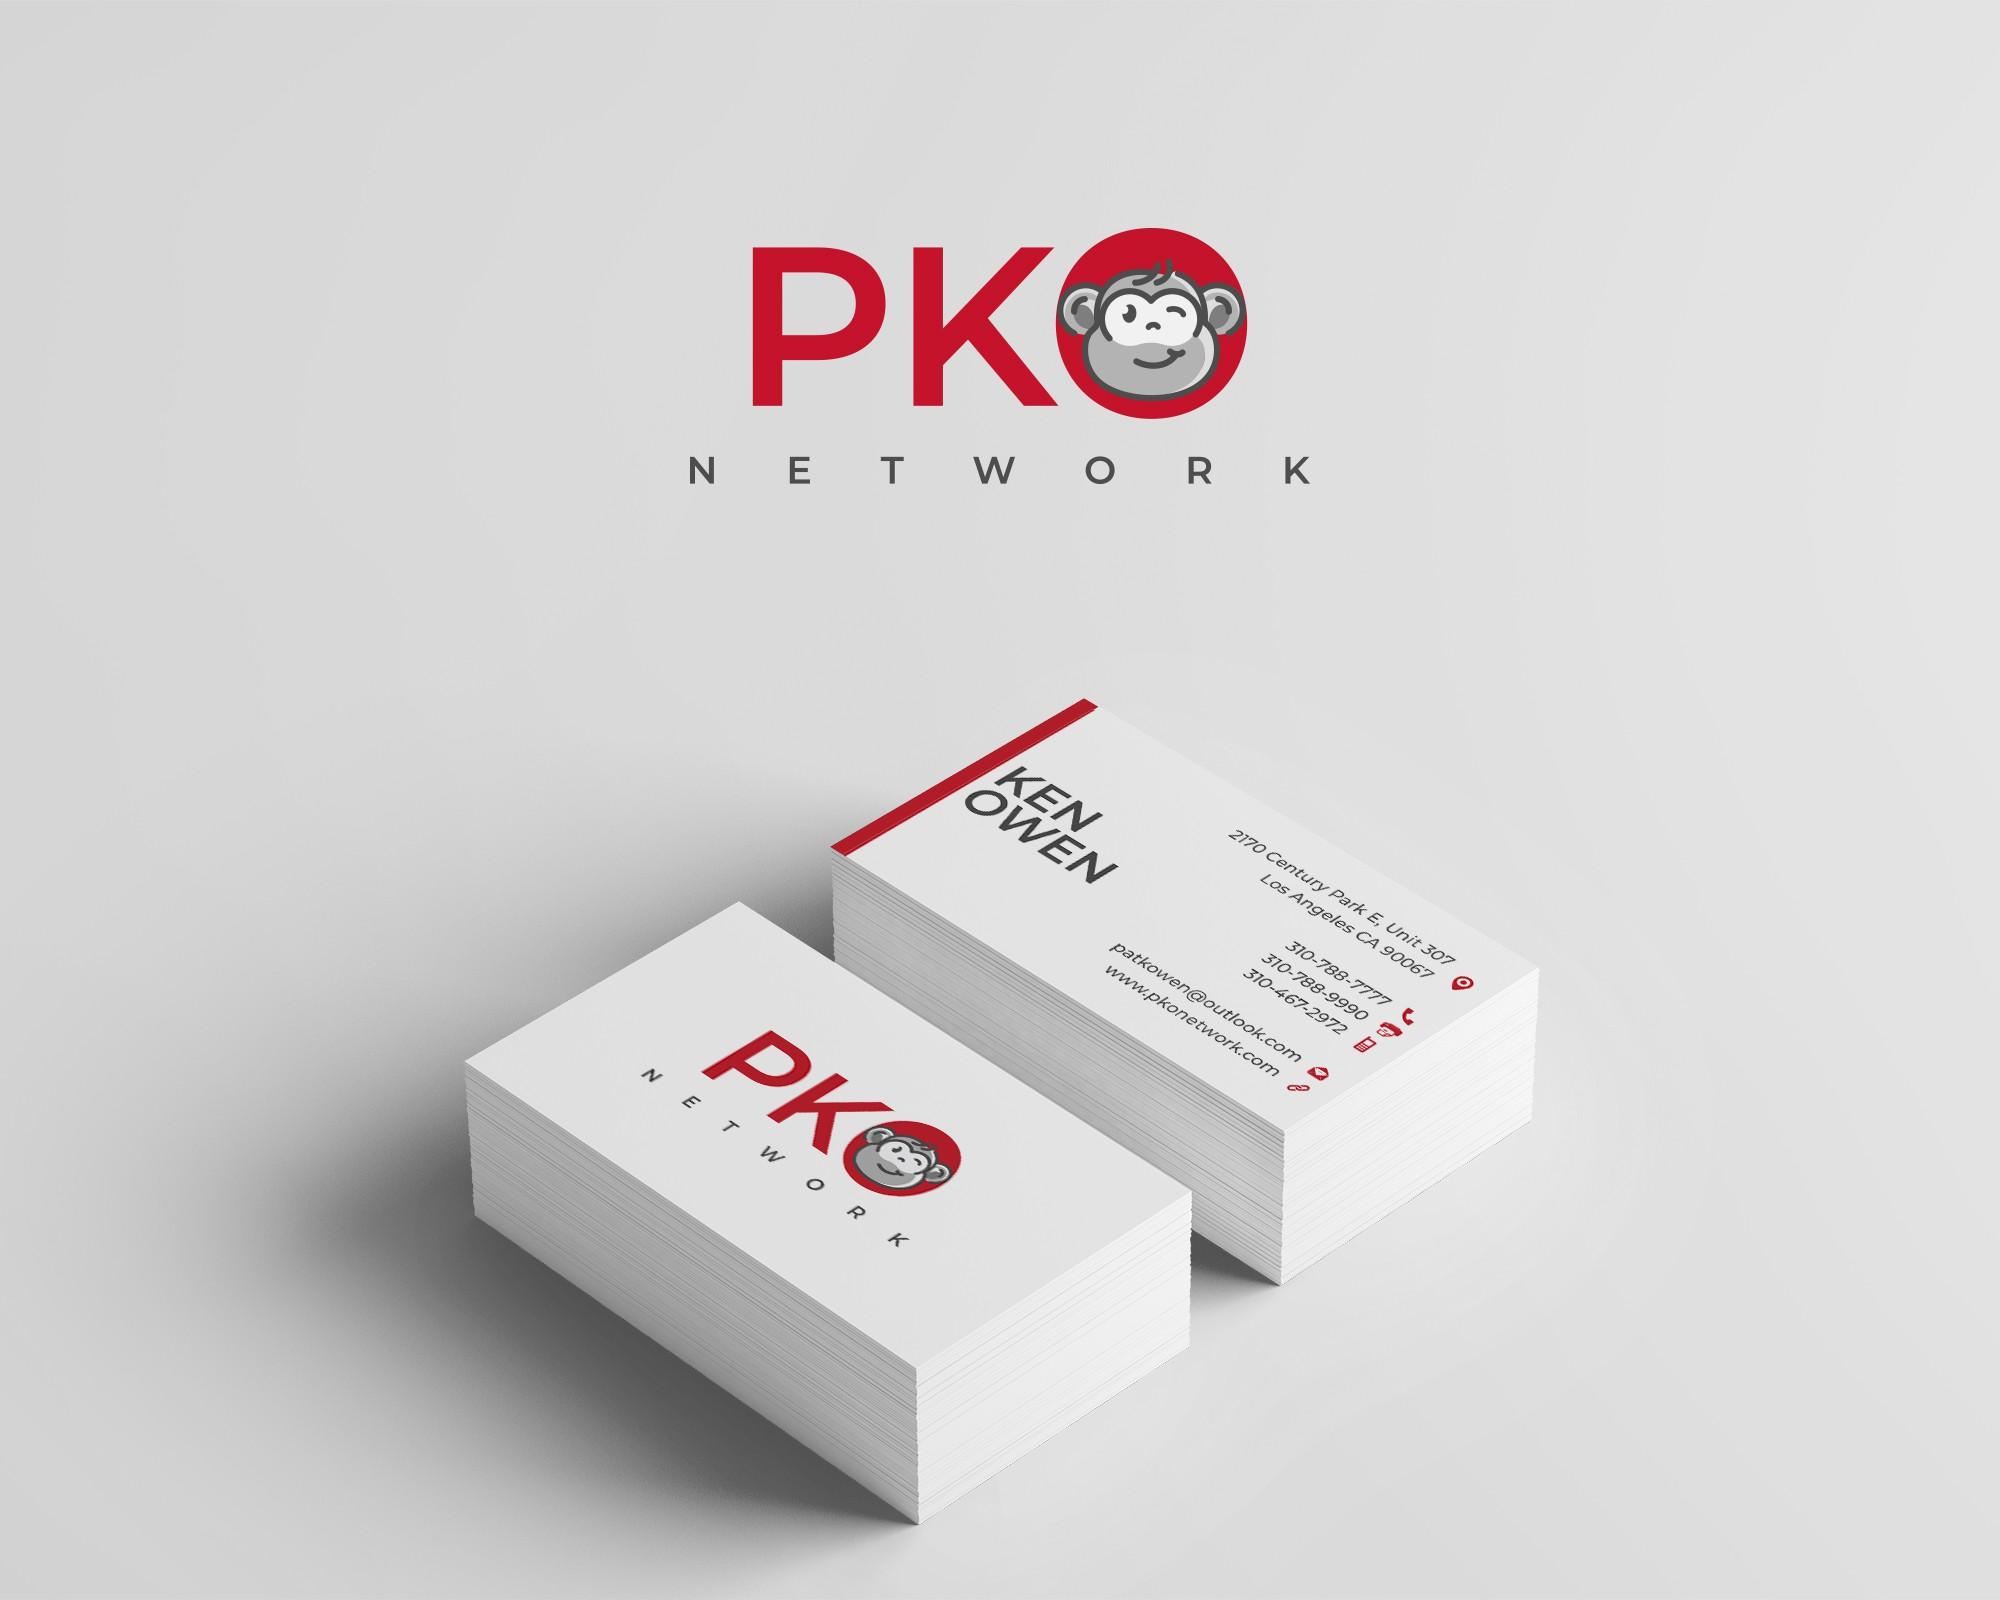 PKO Network